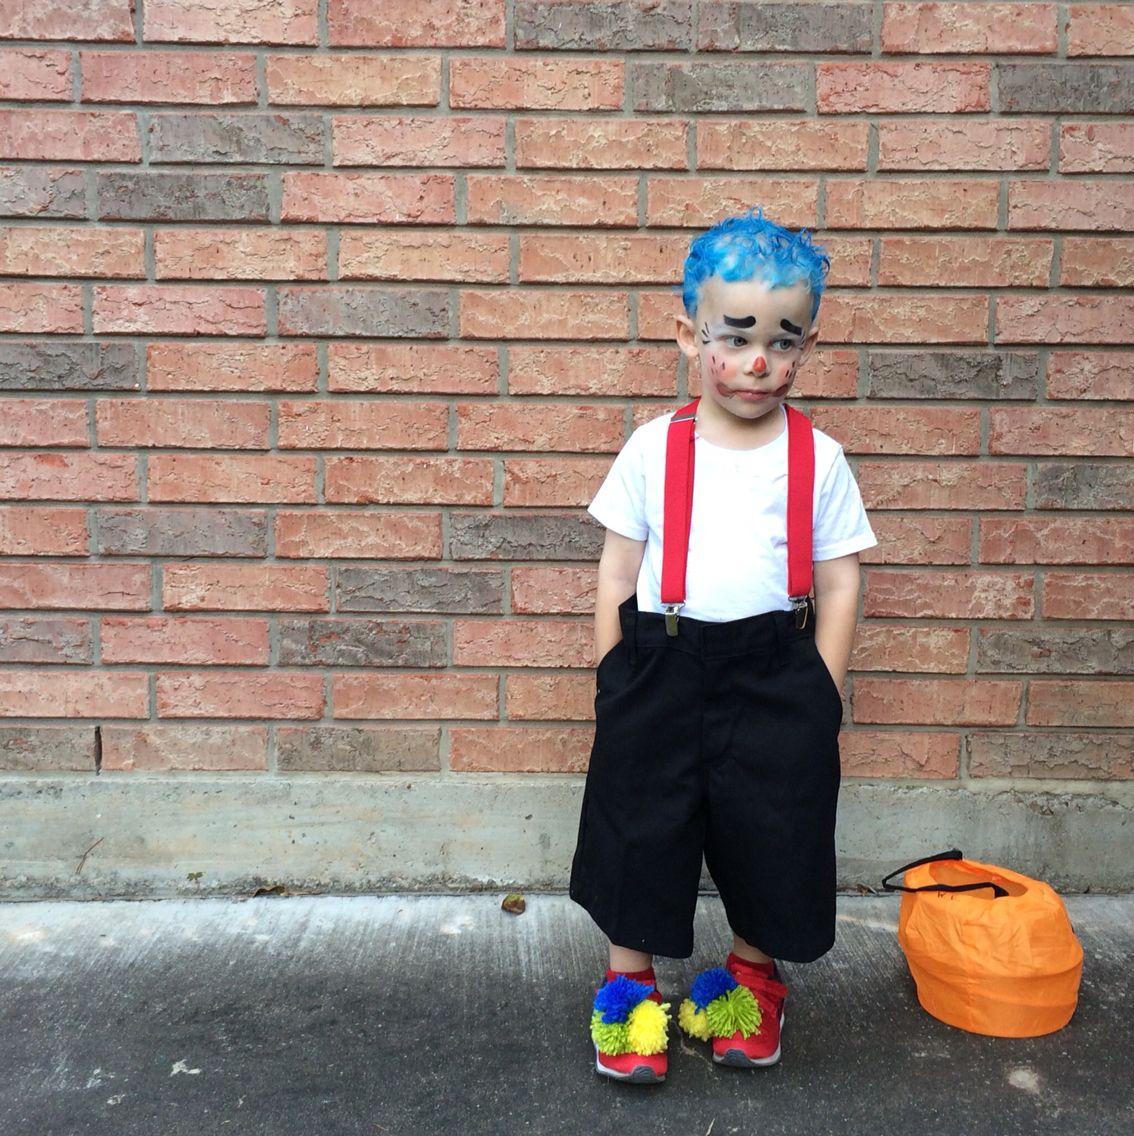 Diy Kids Boy Clown Halloween Costume Yarn Pom Poms Suspenders Big